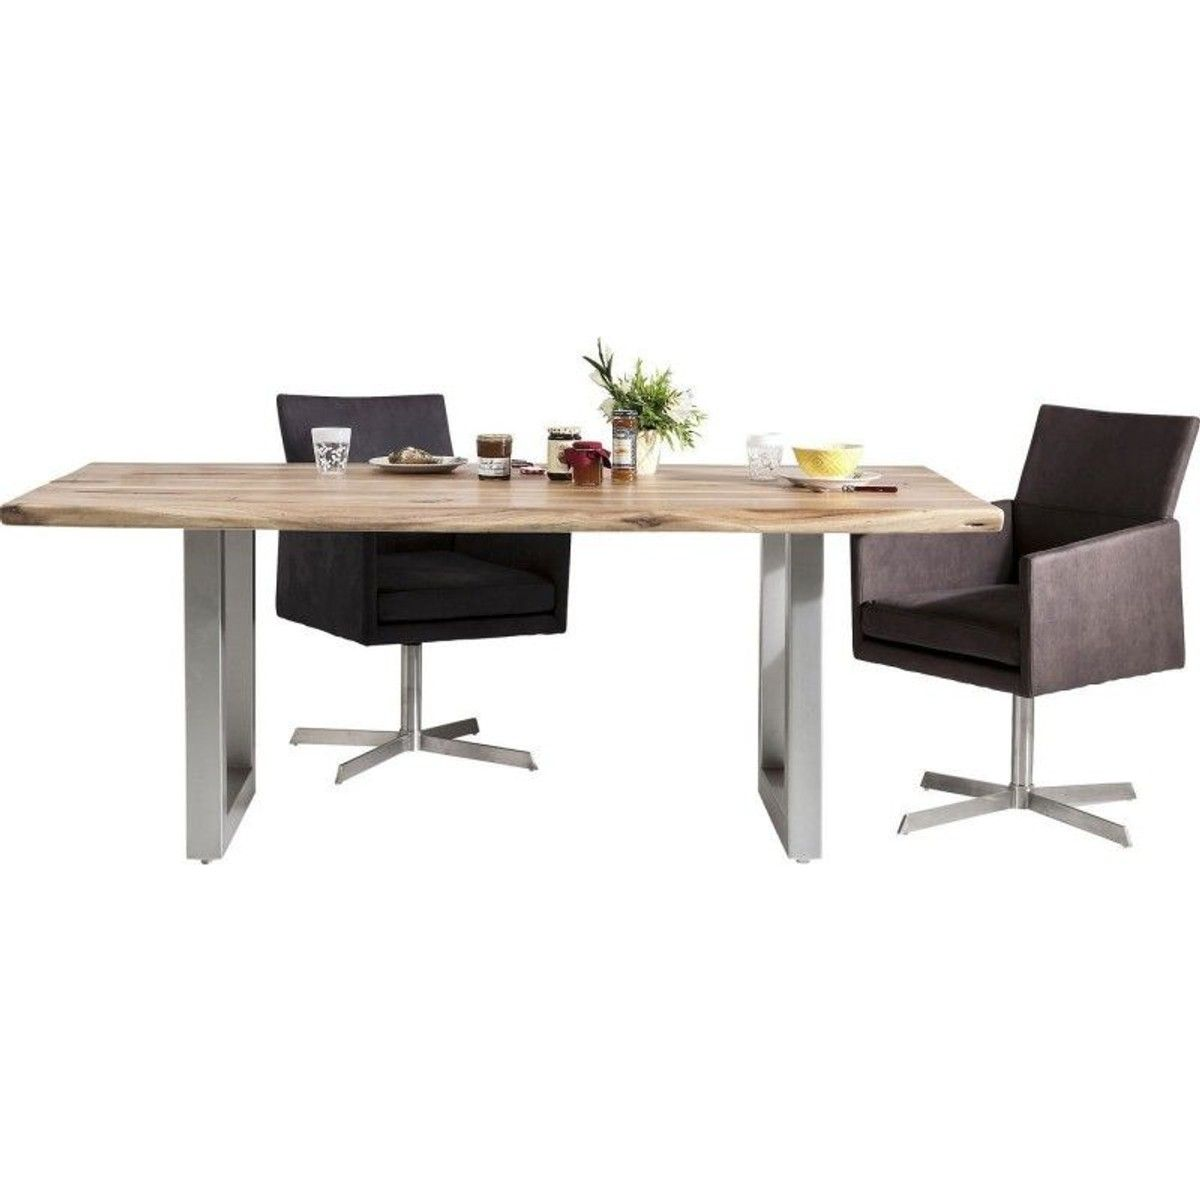 Table En Bois Nature Line 180x90cm Kare Design Taille 6 Pers